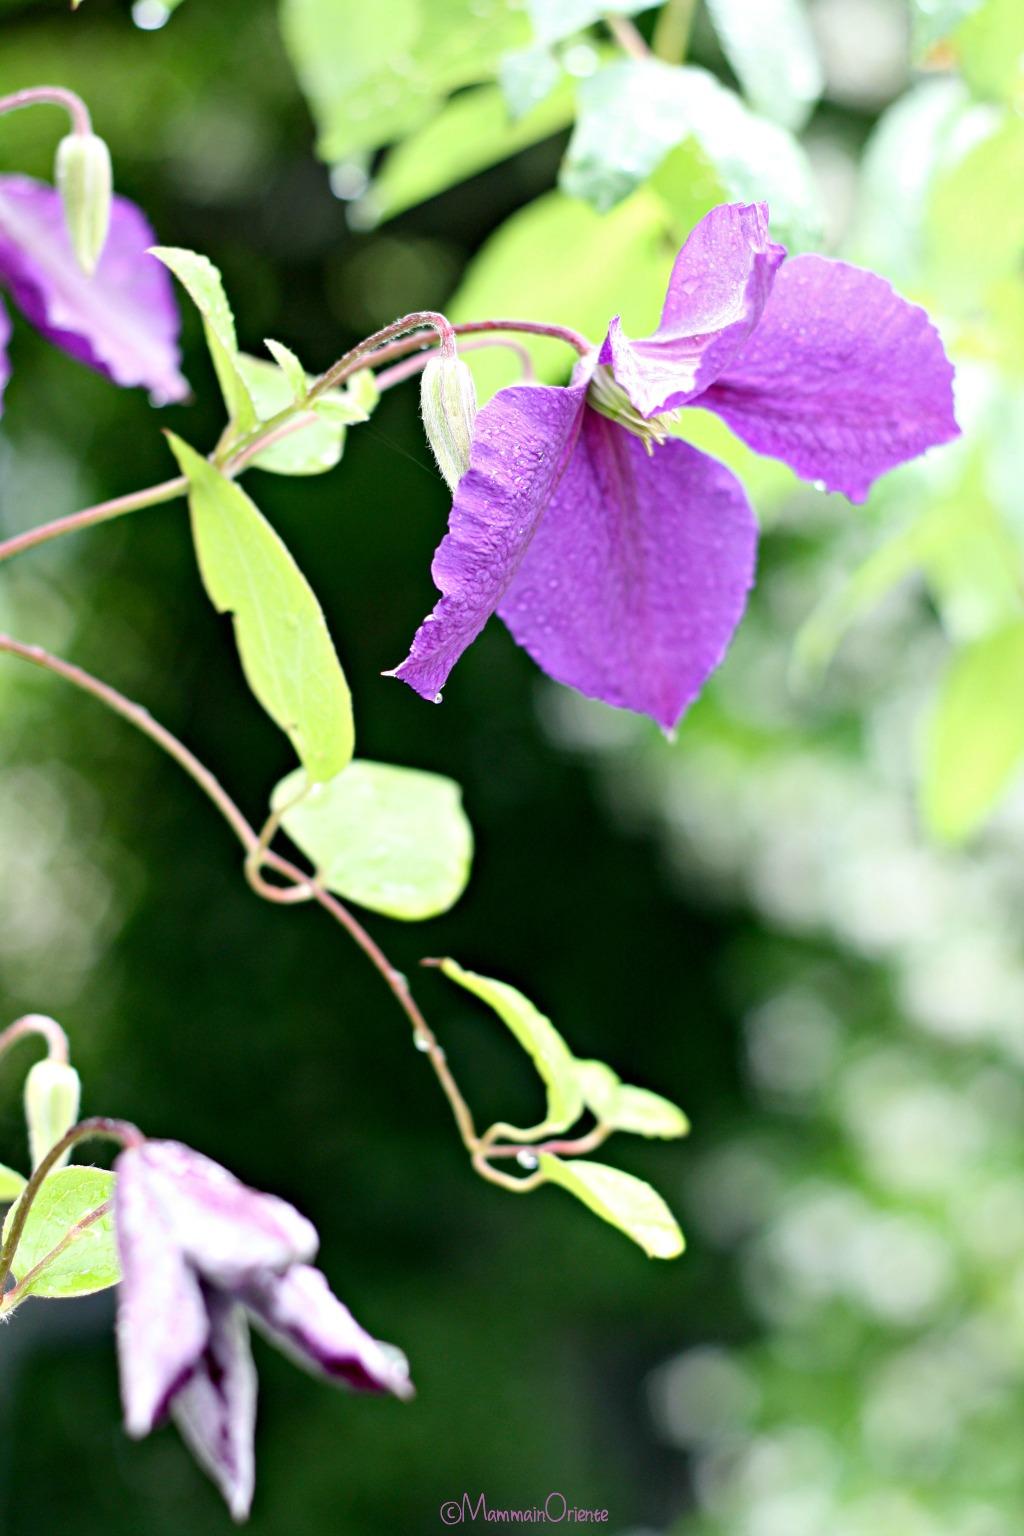 Clematis viola